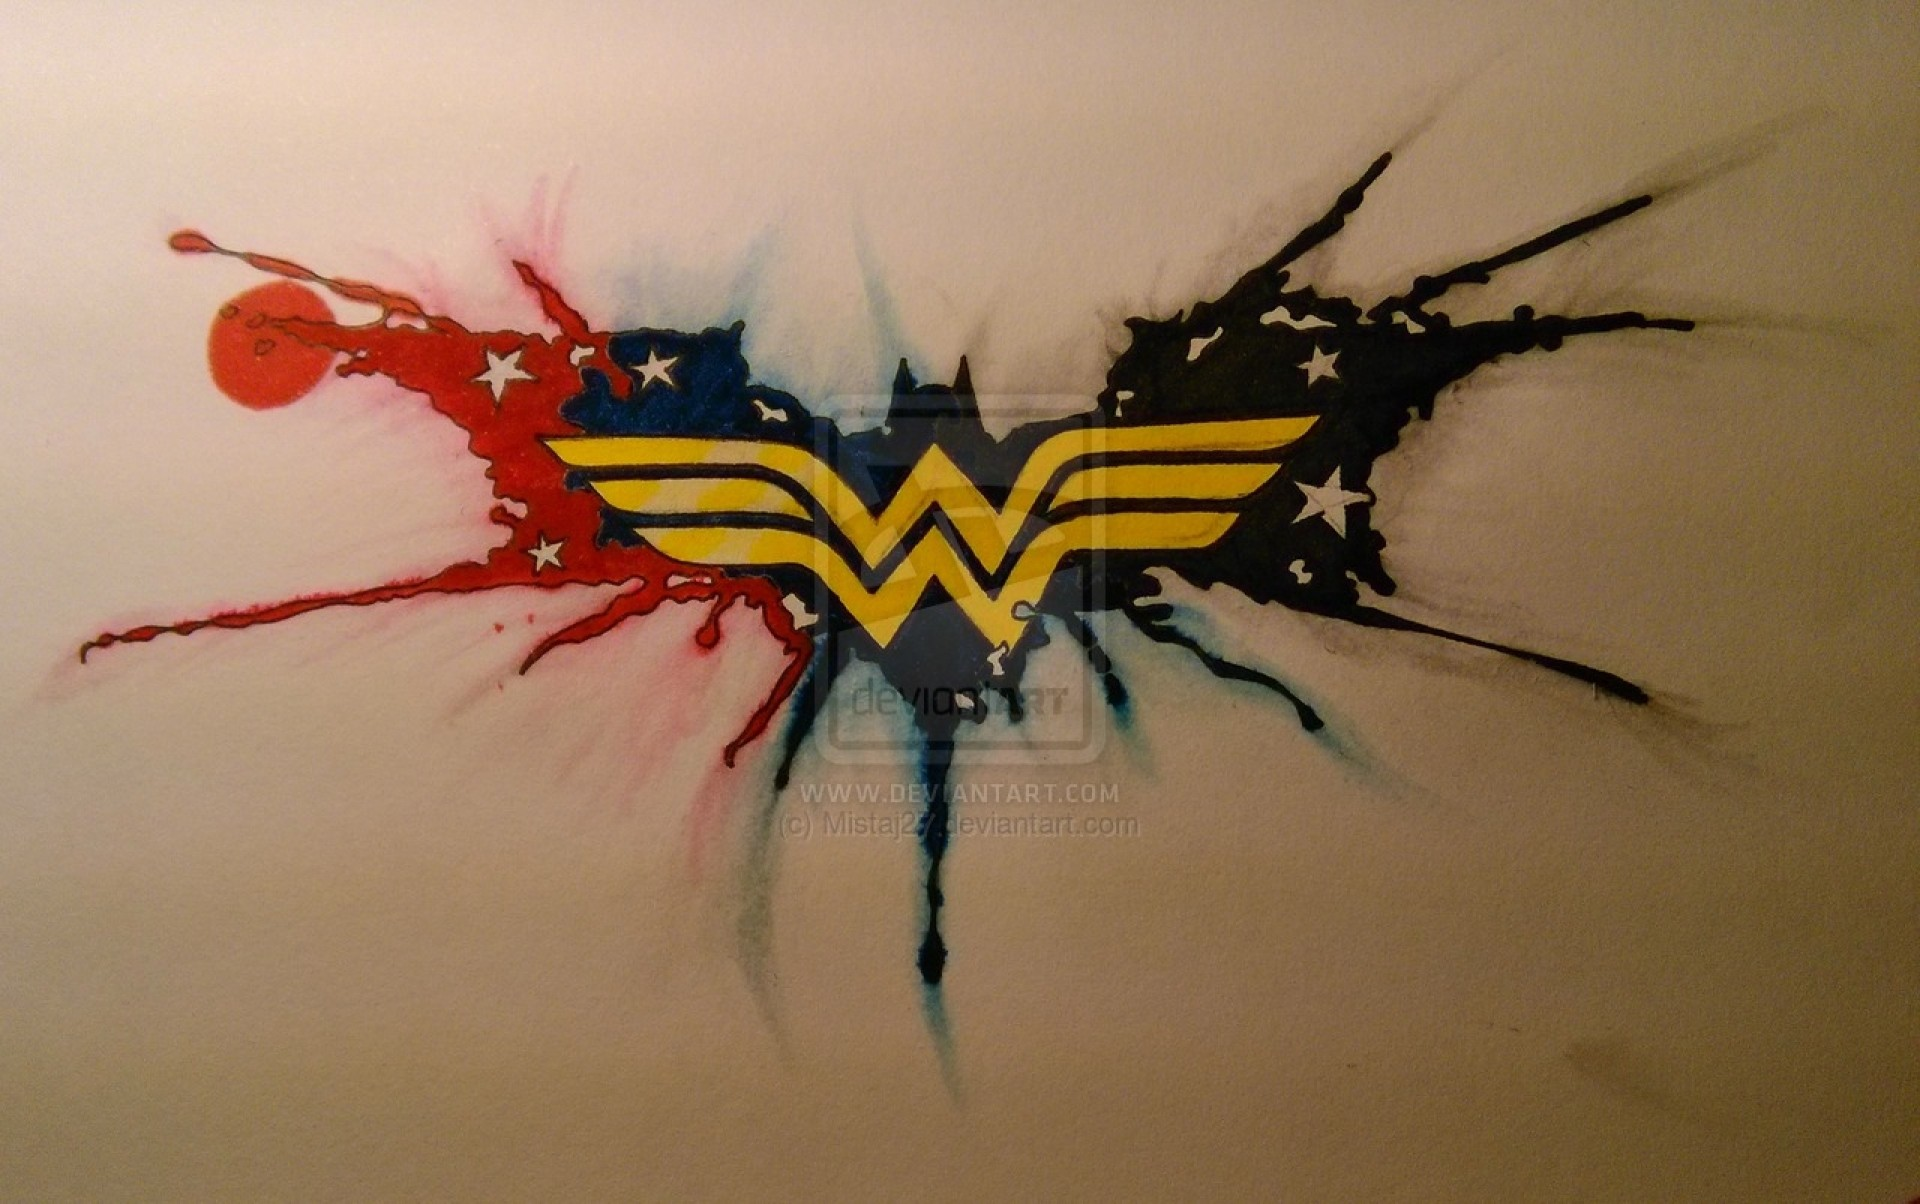 Wonder Woman Logo Tattoo Designs iPhone 7 Wallpapers HD